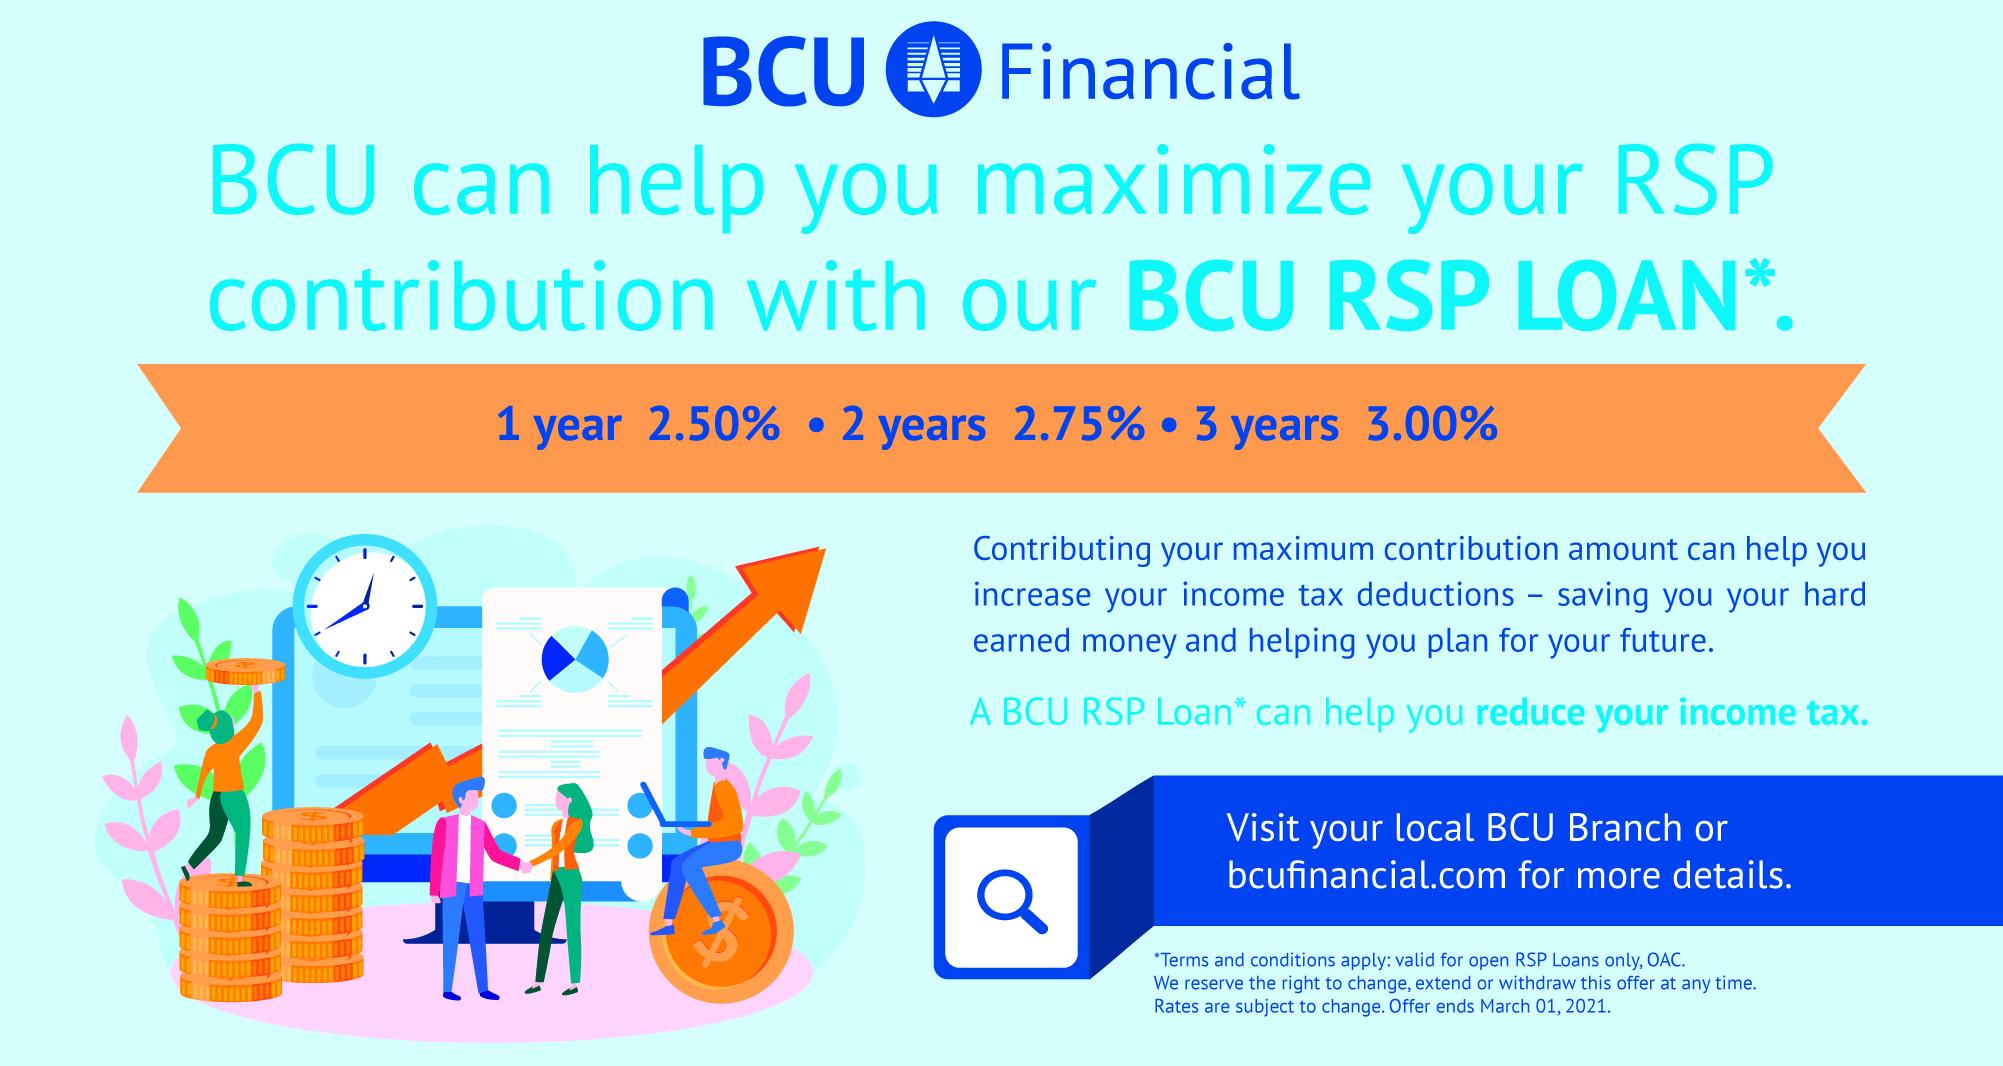 BCU RSP Loans